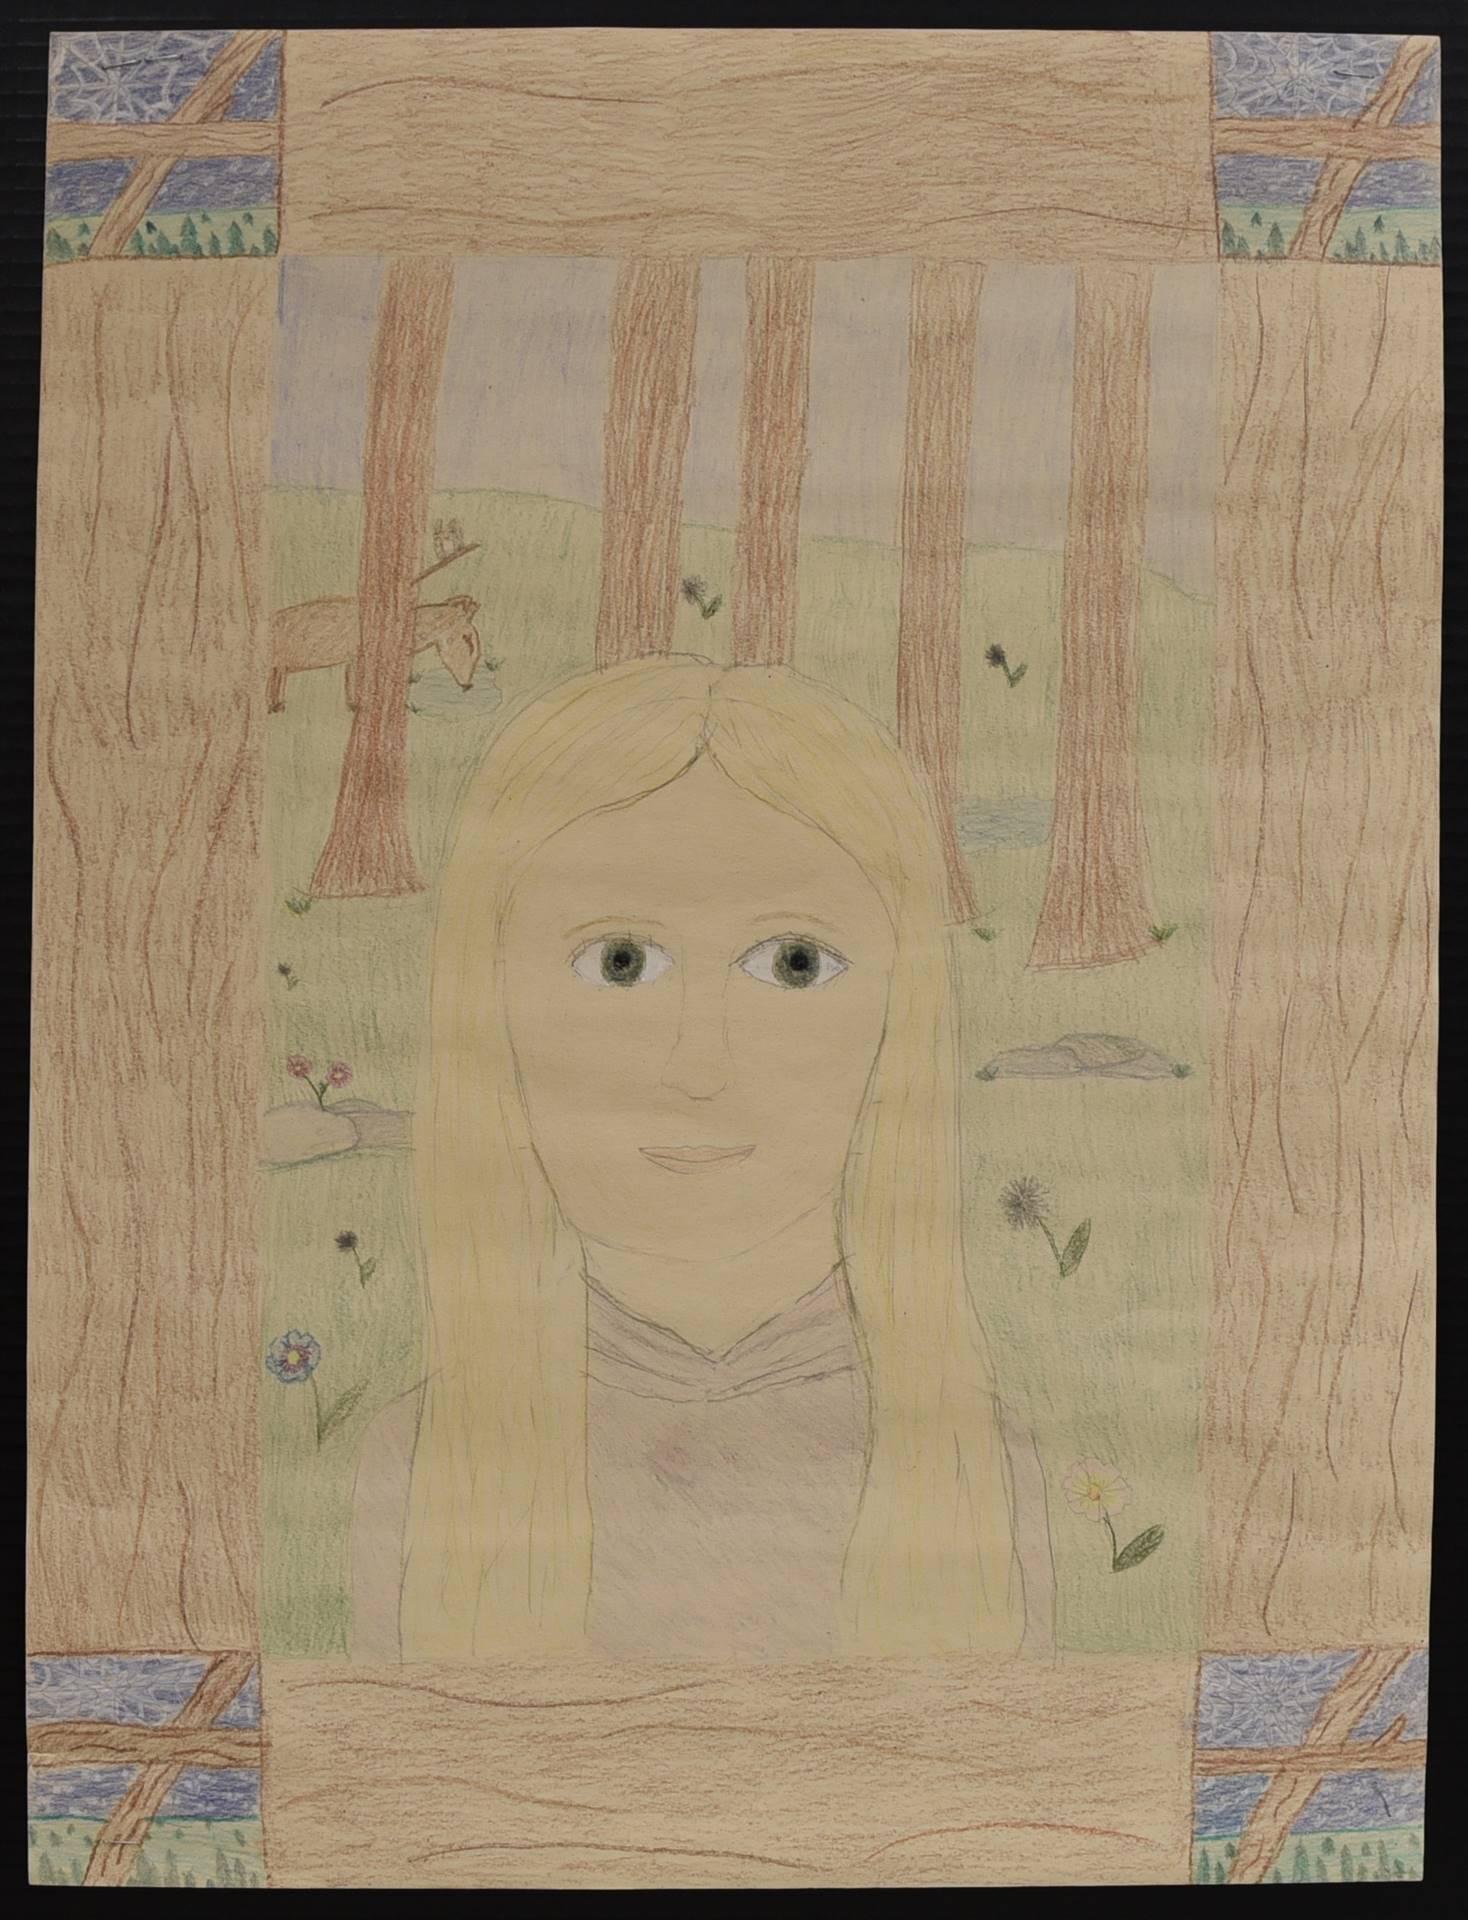 Brecksville-Broadview Hts. Middle School Art Projects 160